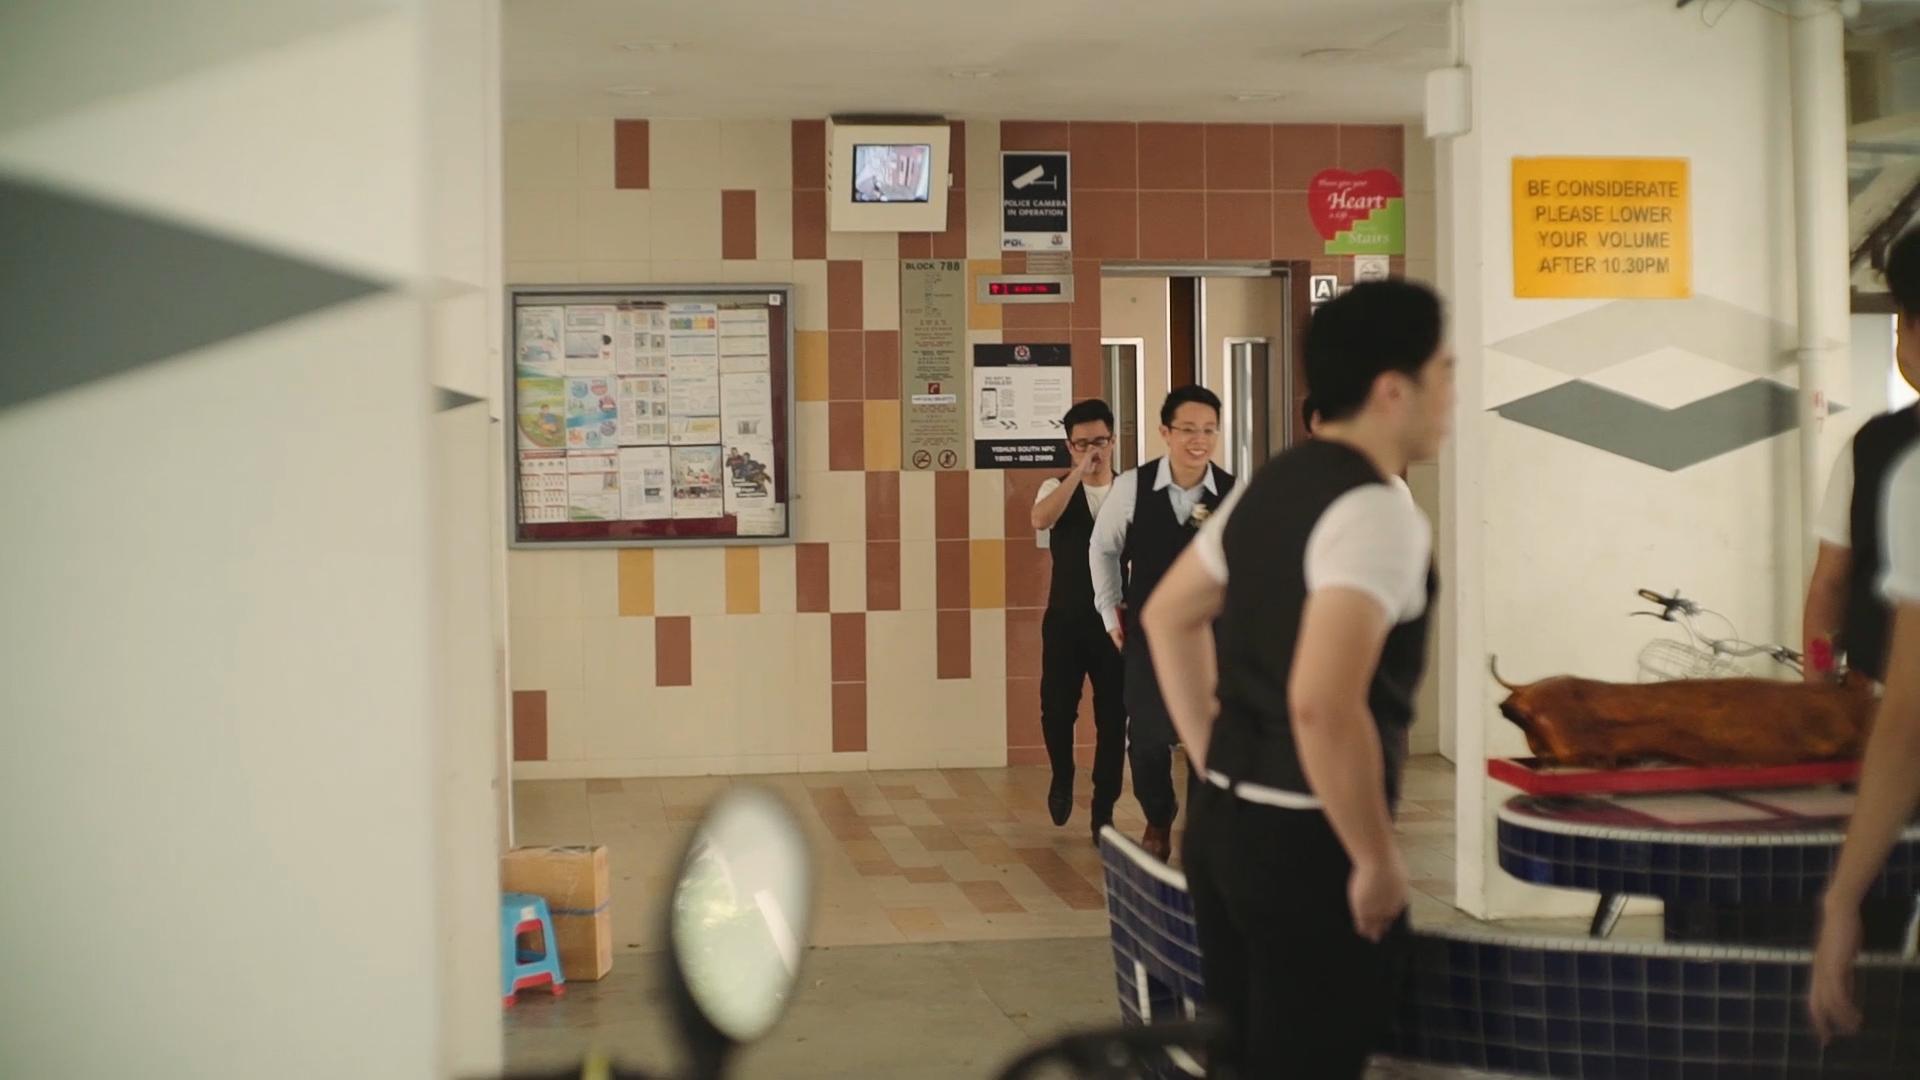 FFK_IG_59s_Screenshot_Jonathan and Qingning_001.jpg